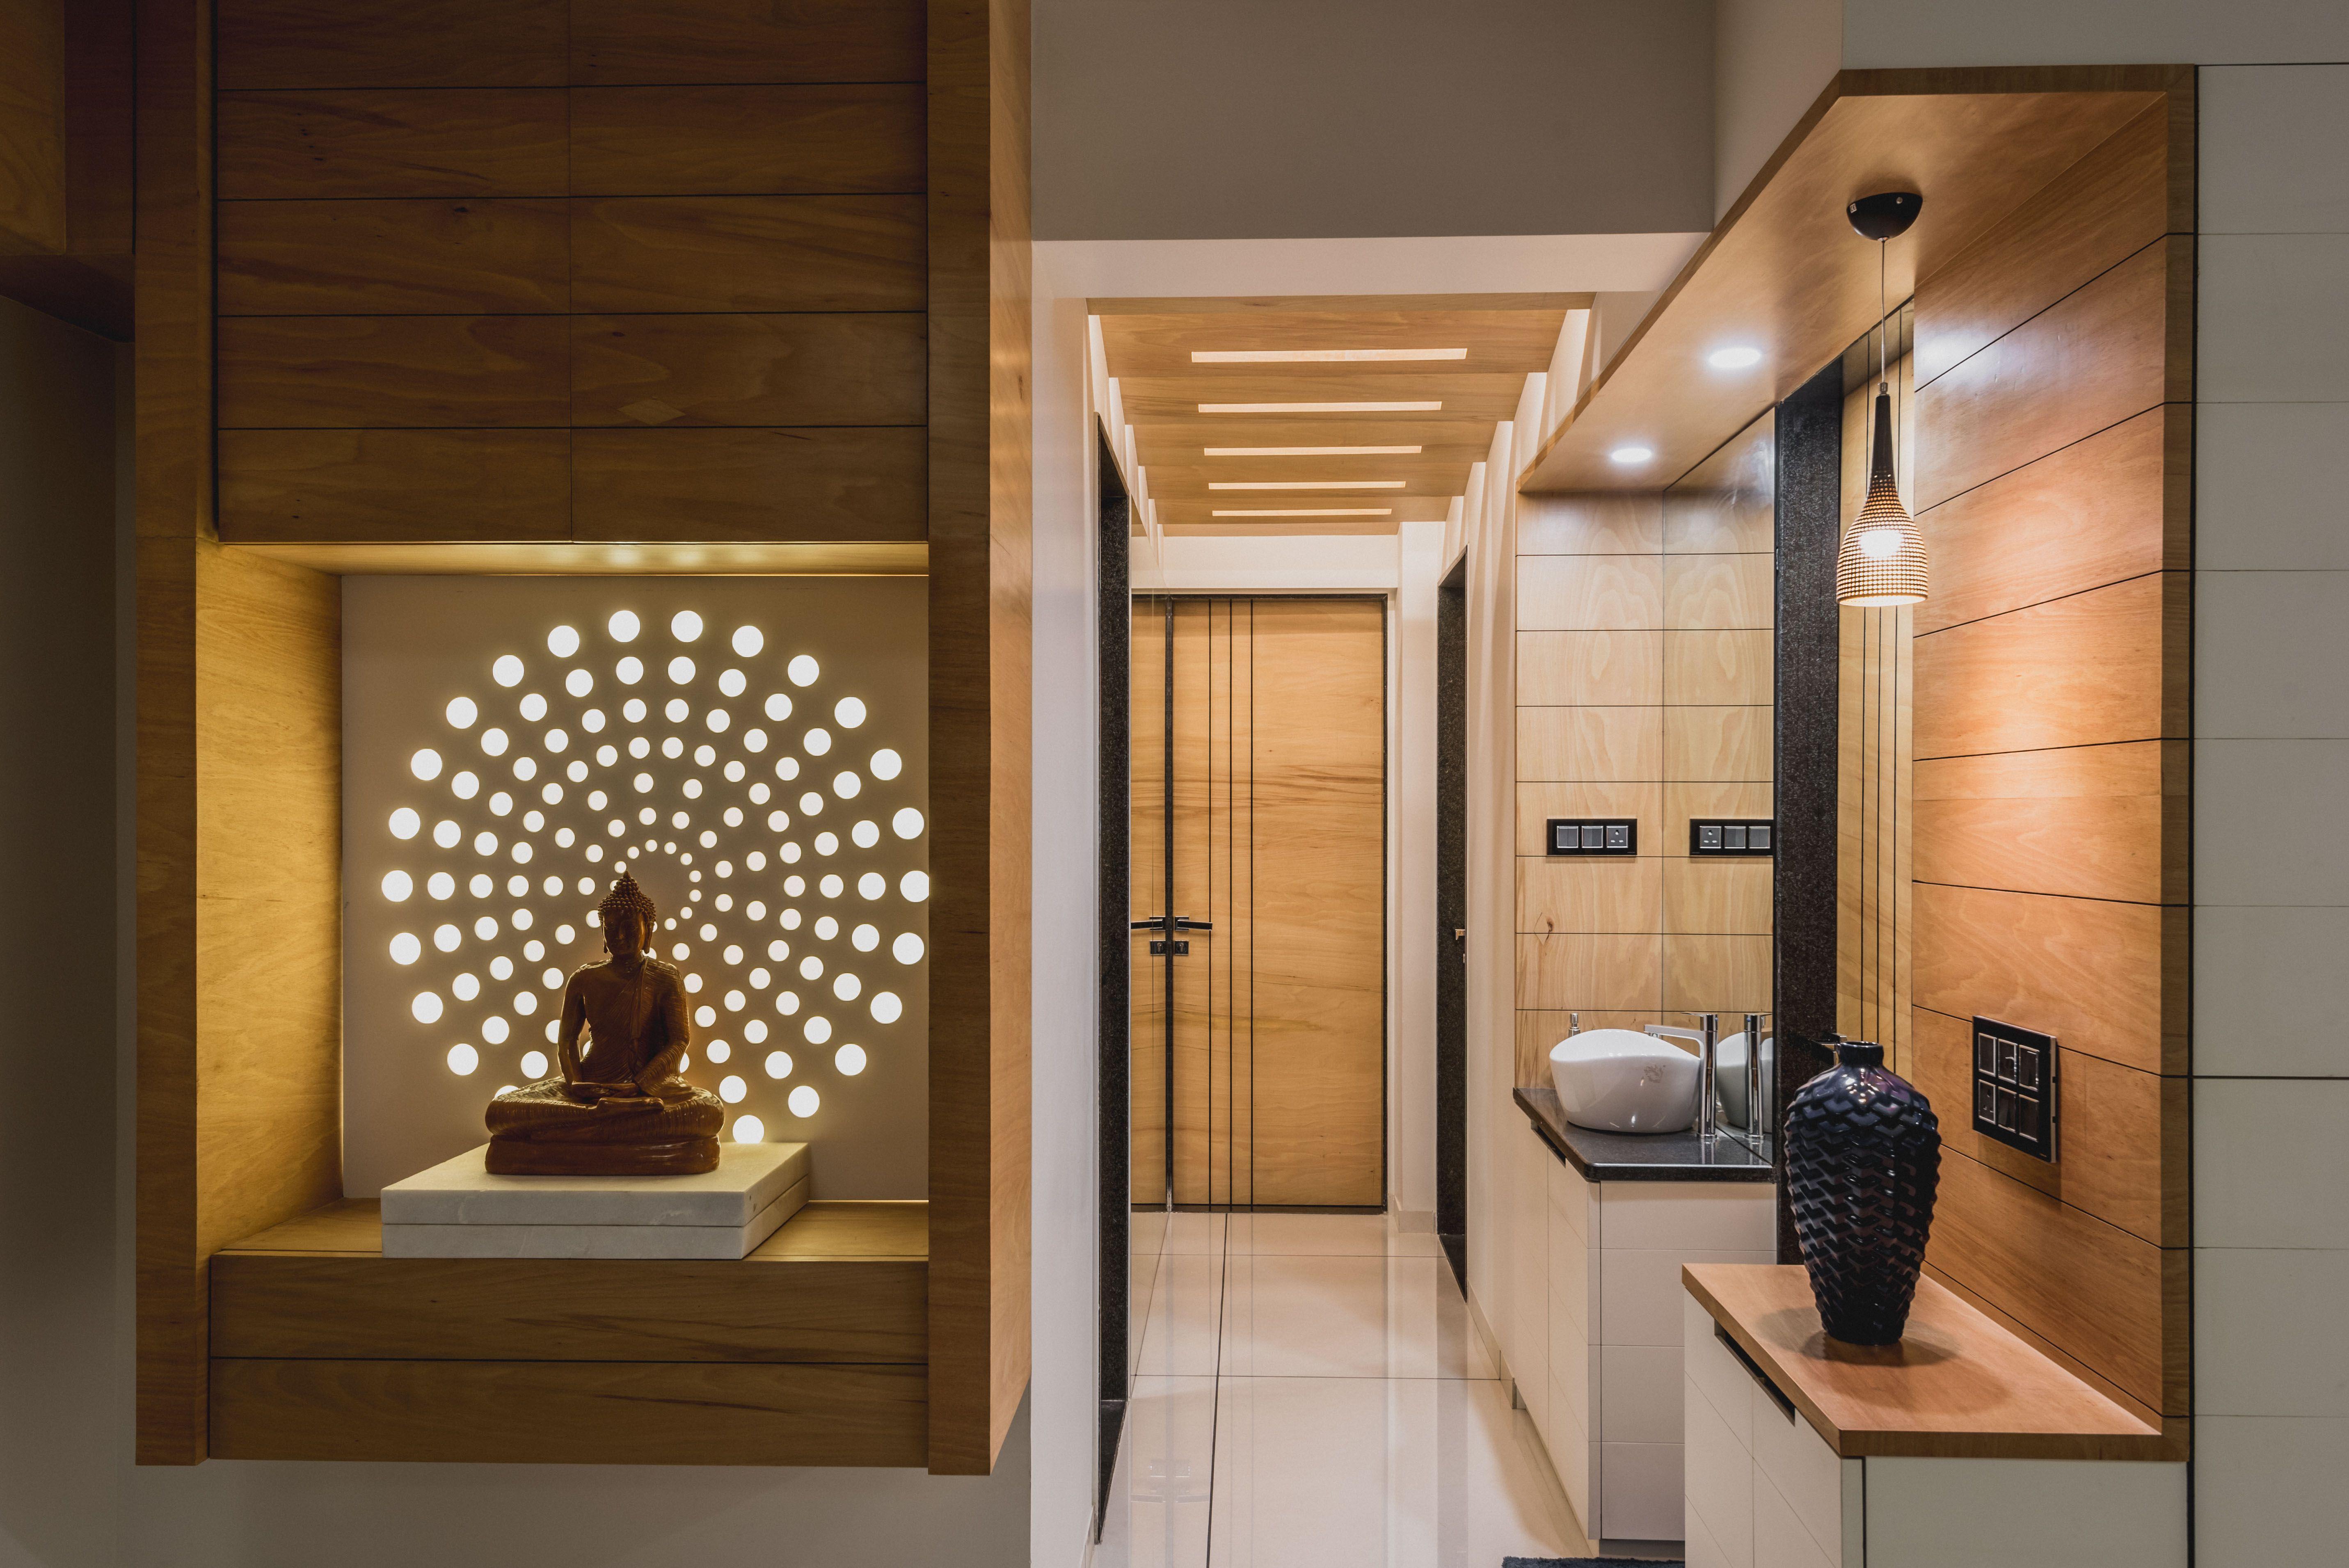 अभिलाषा - Pavan Infratech | Flat interior design, Pooja ...